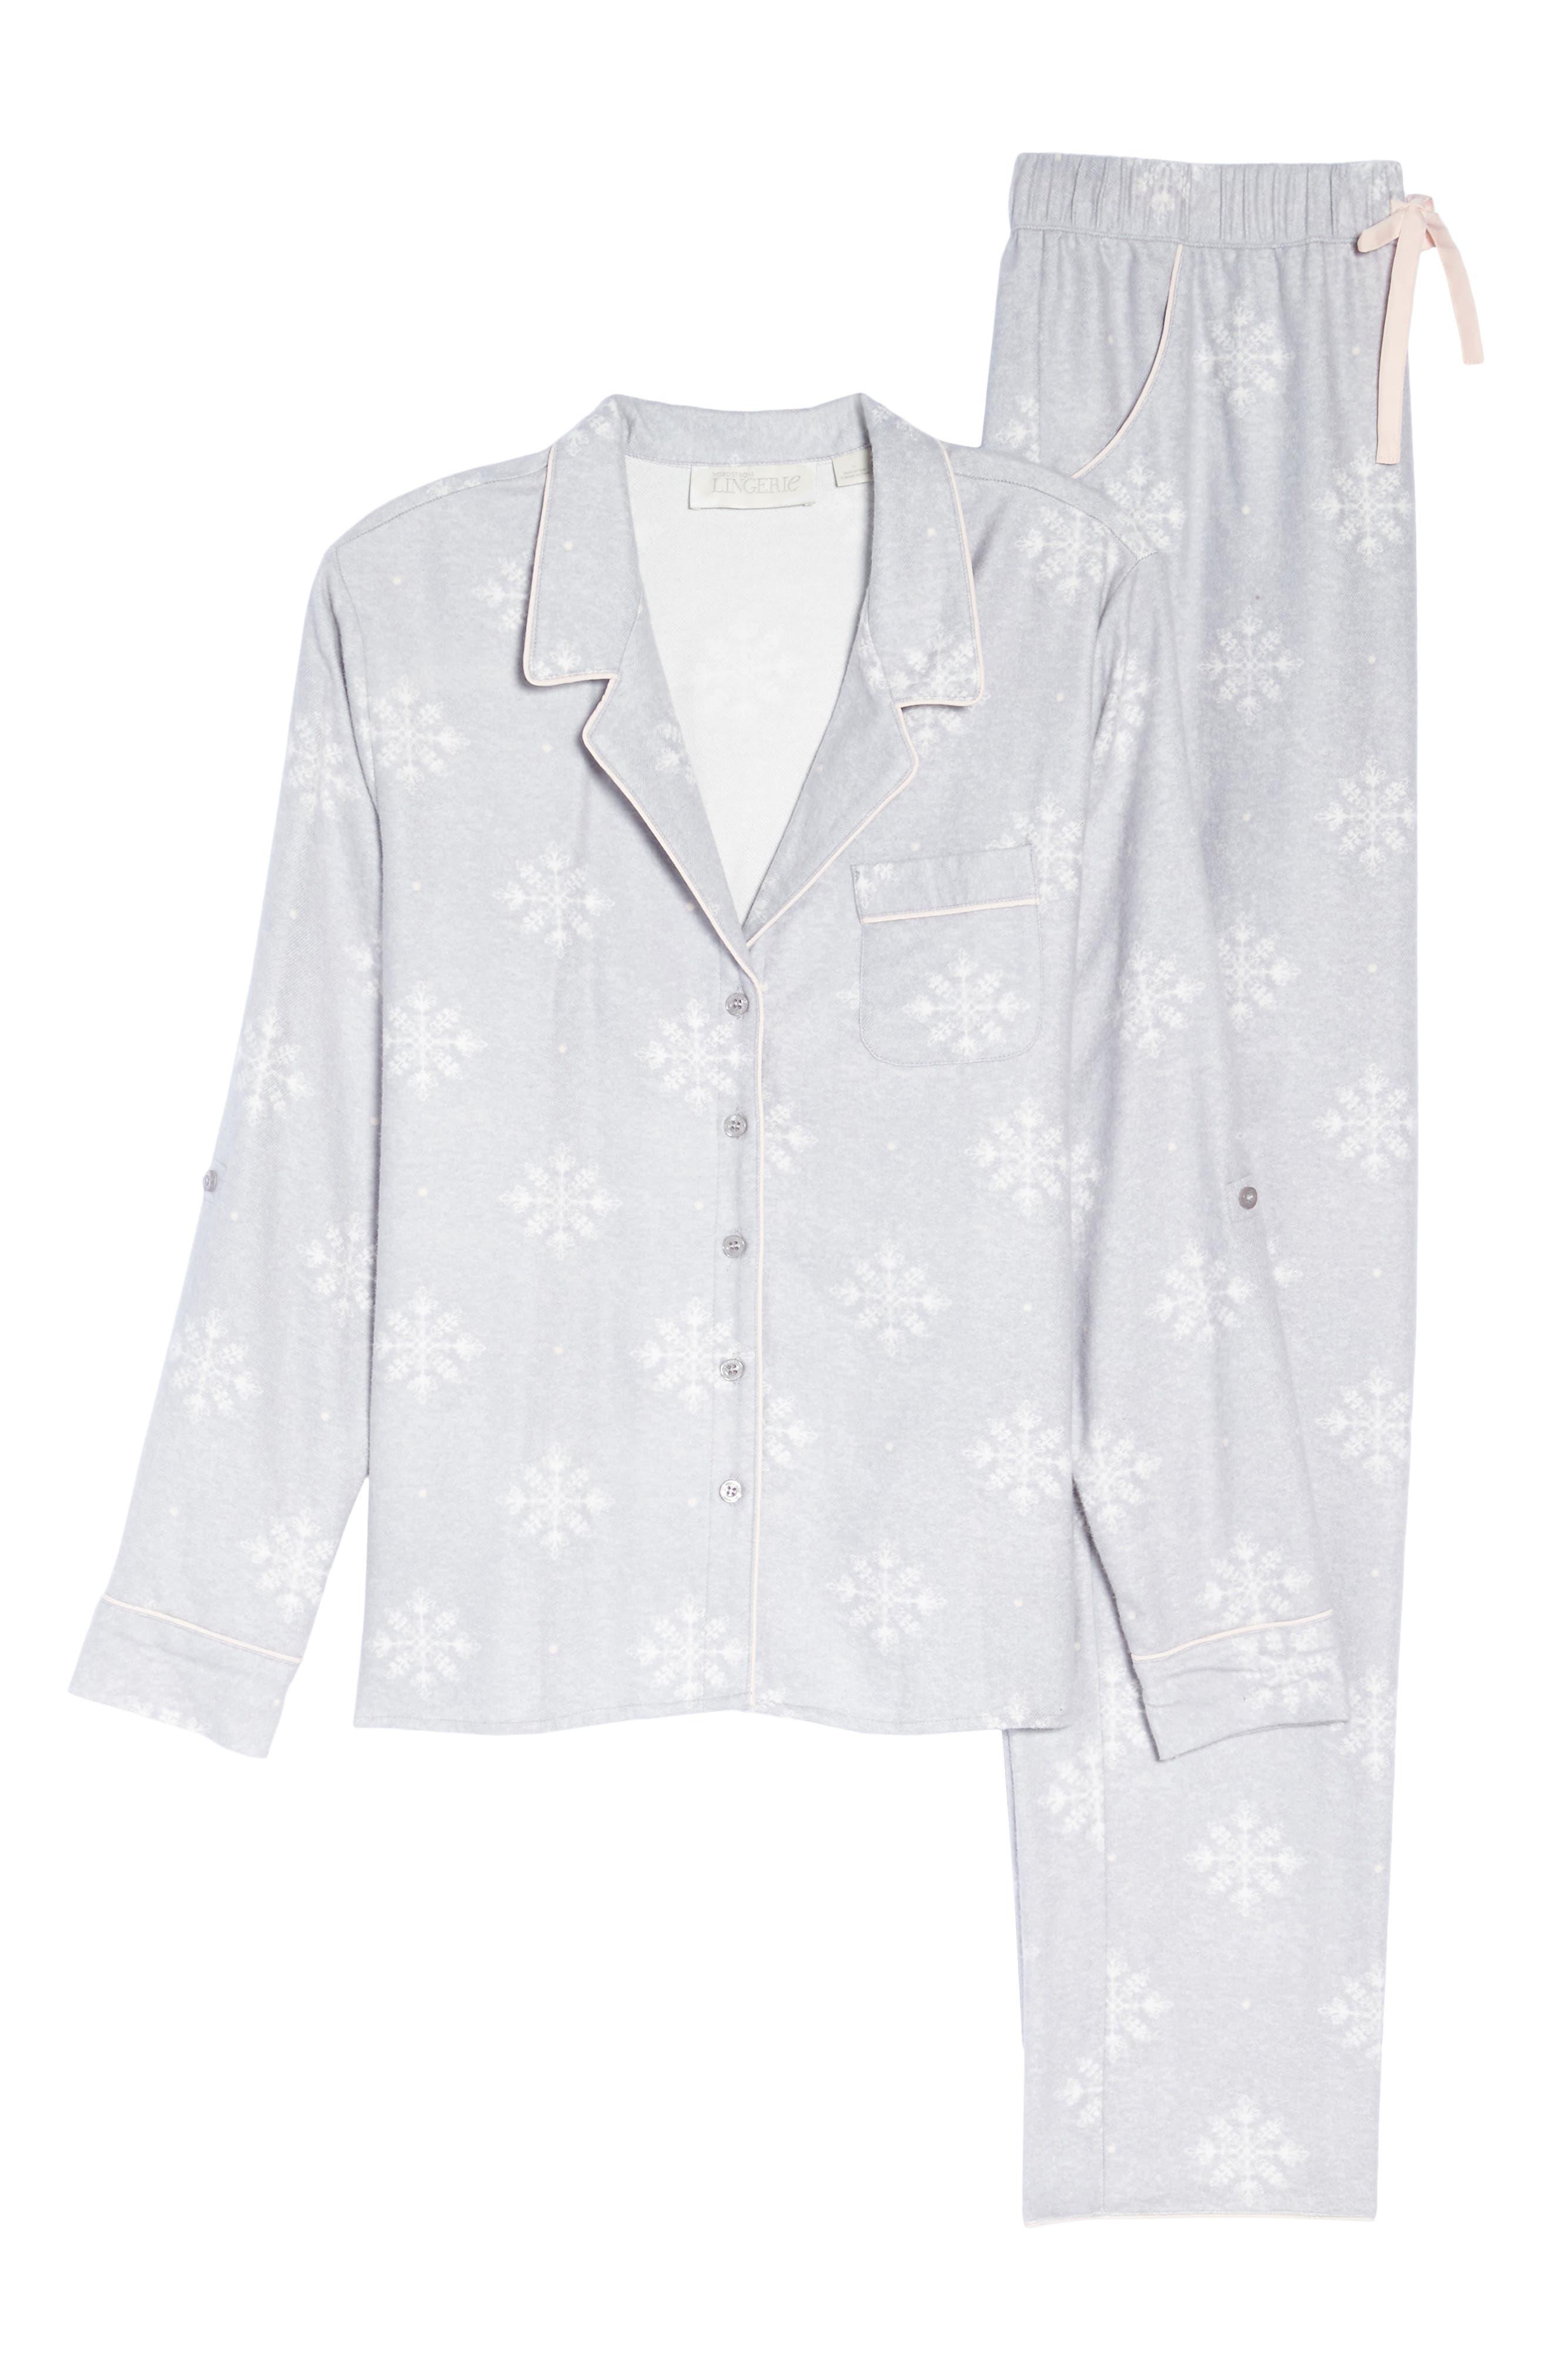 Lingerie Starlight Flannel Pajamas,                             Alternate thumbnail 26, color,